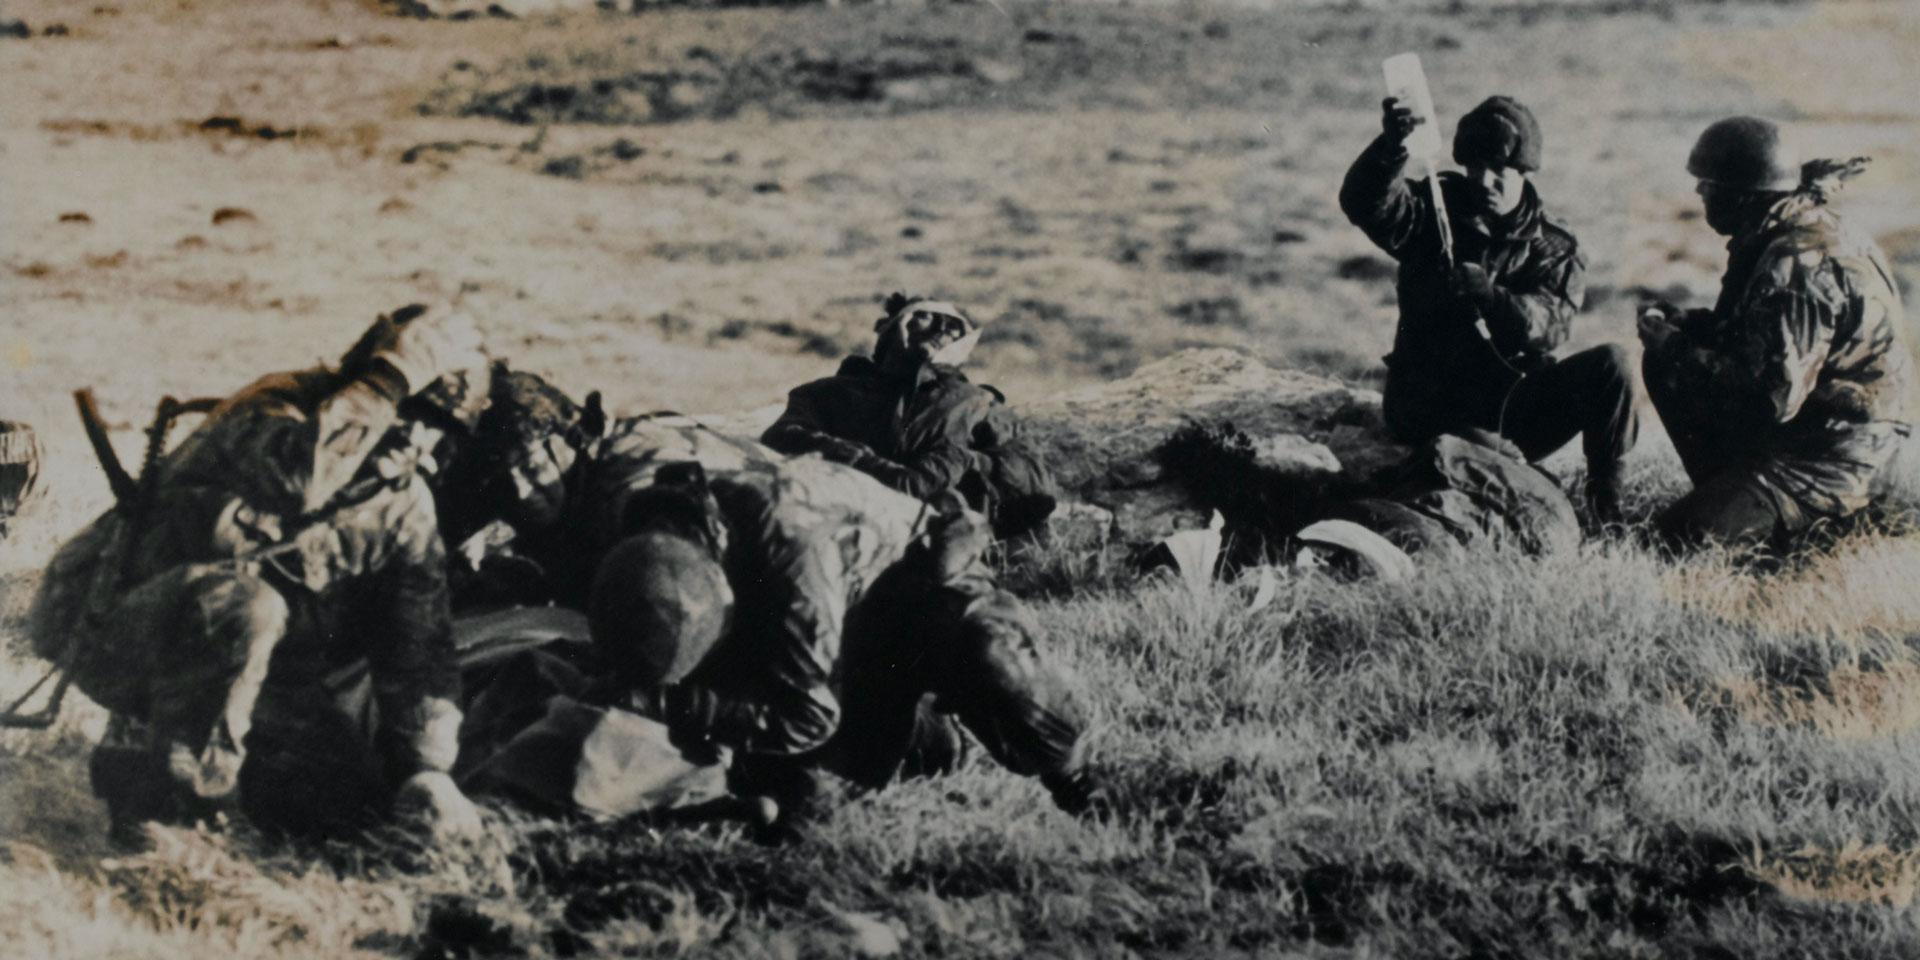 Paramedics attending a wounded Argentine soldier under fire, Mount Longdon, Falkland Islands, 1982